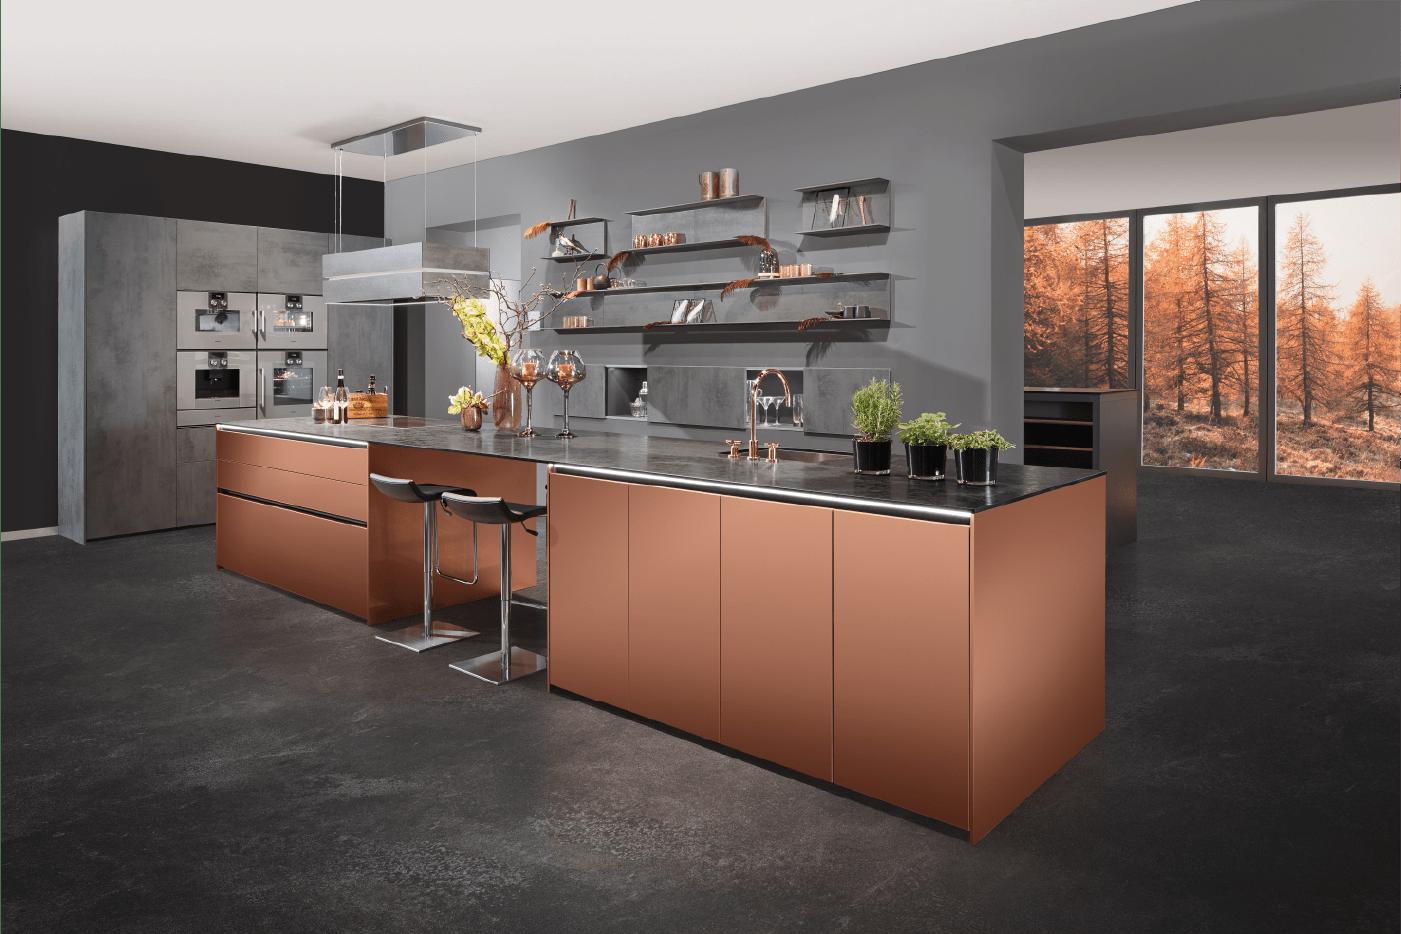 Cabeo-keukens-1-keuken-foto-8